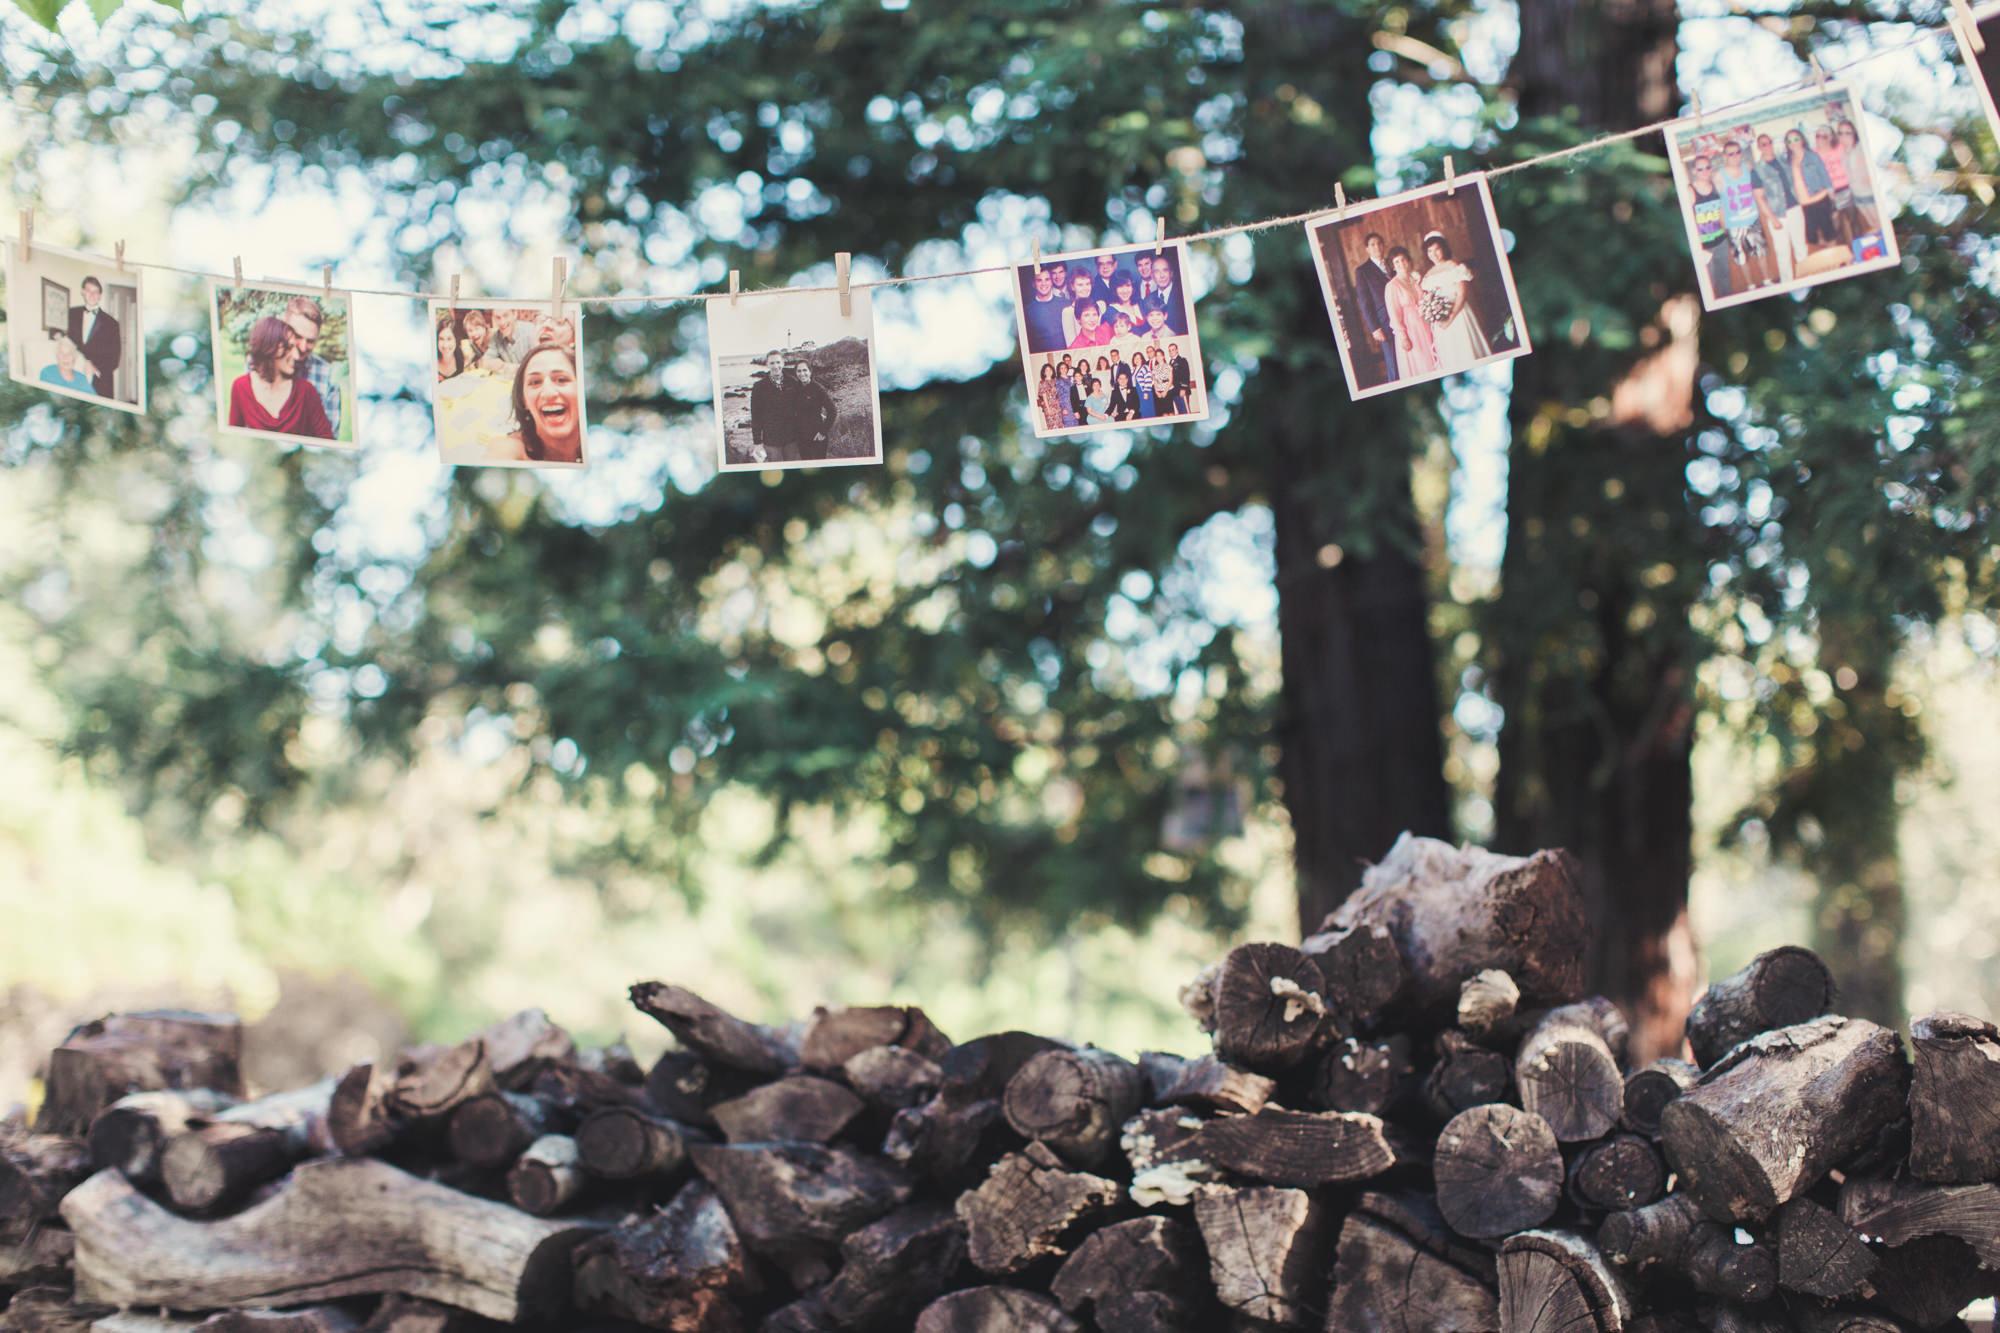 Backyard Wedding in California©Anne-Claire Brun 0017